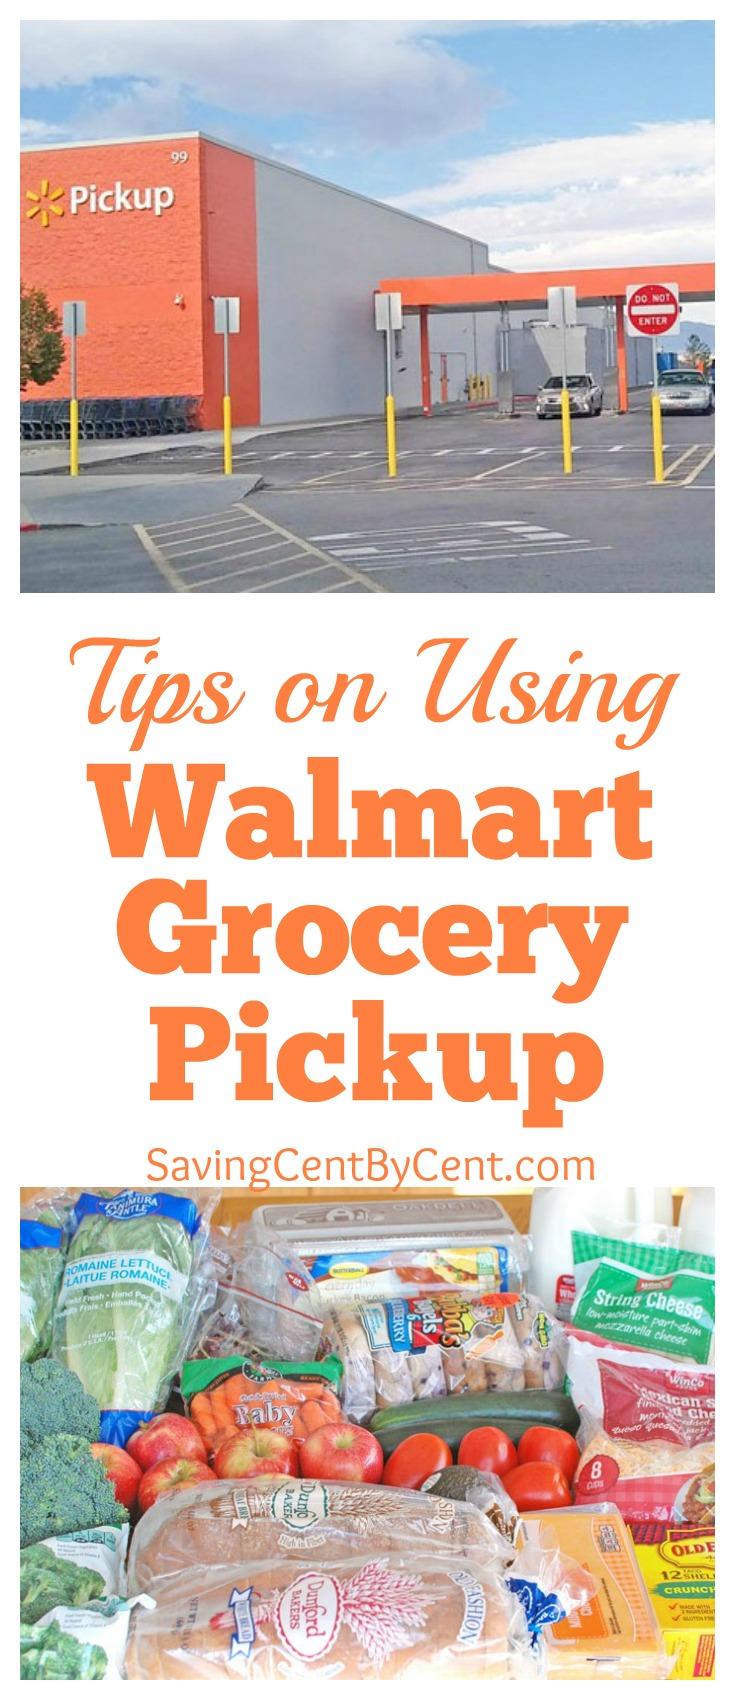 Walmart Grocery Pickup Tips